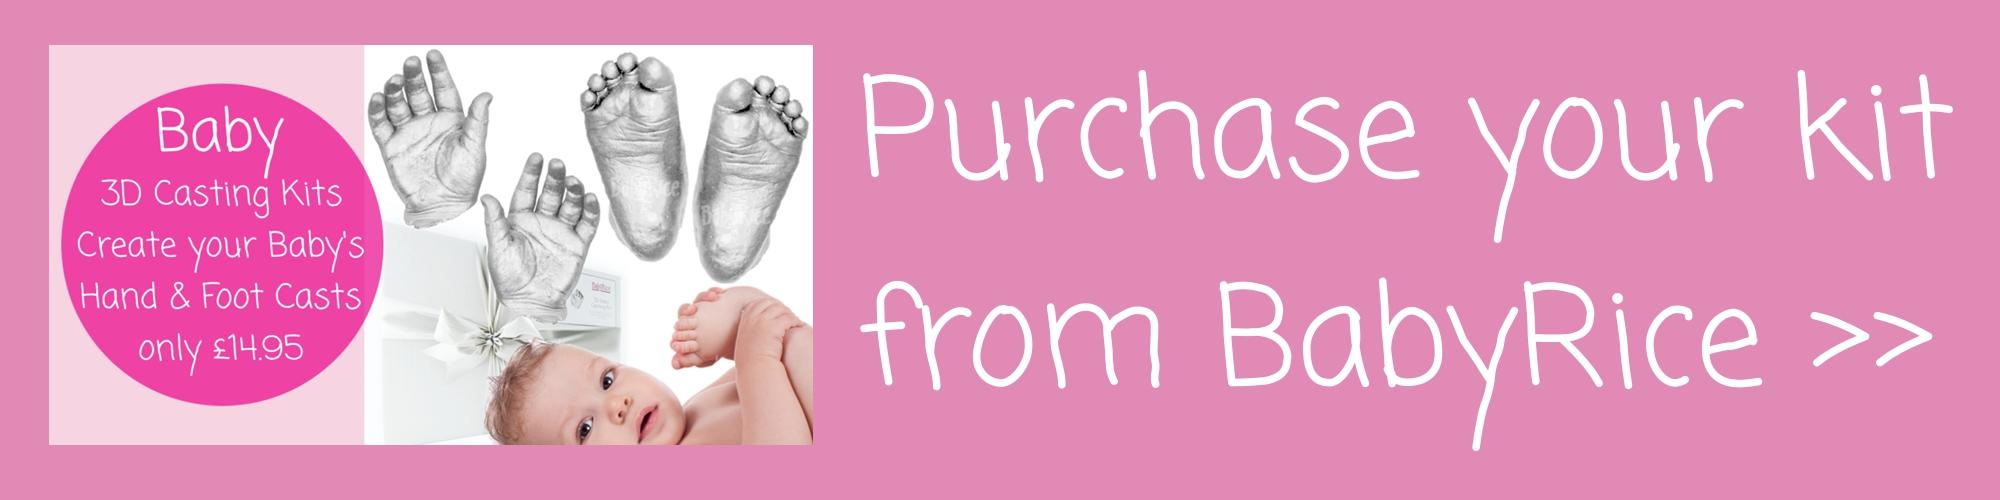 Buy a BabyRice Casting Kit